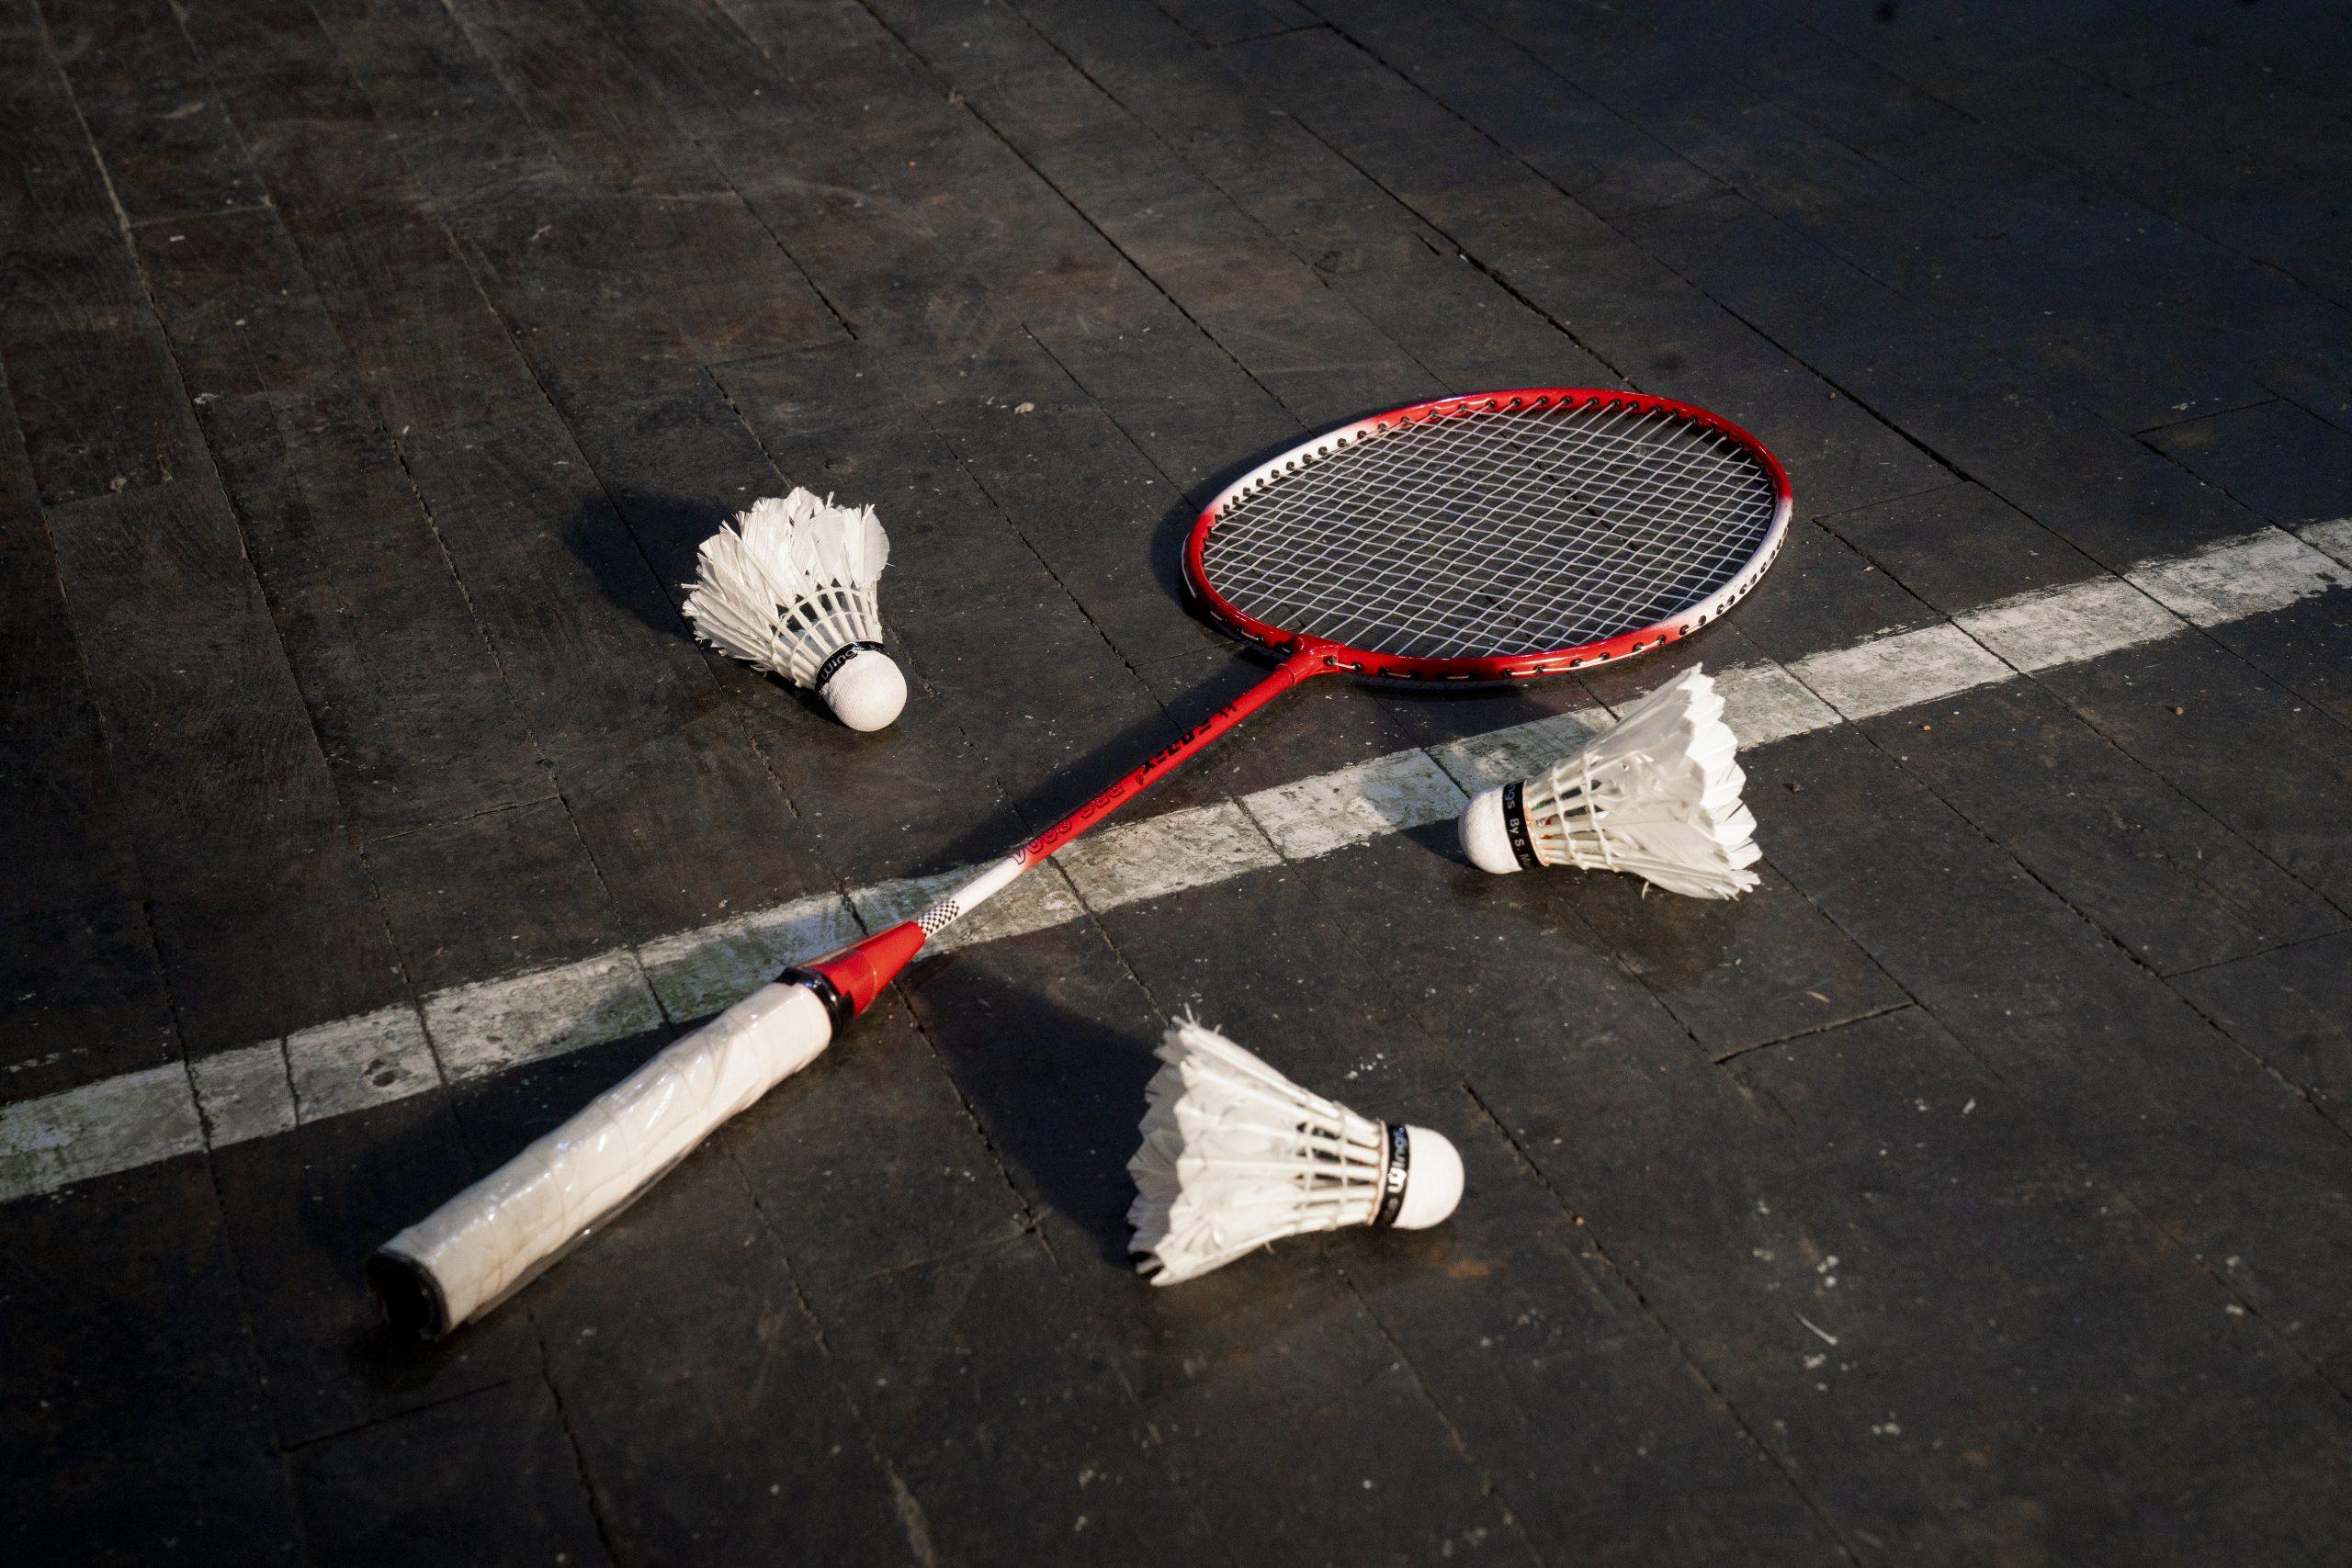 badminton and shuttle cocks